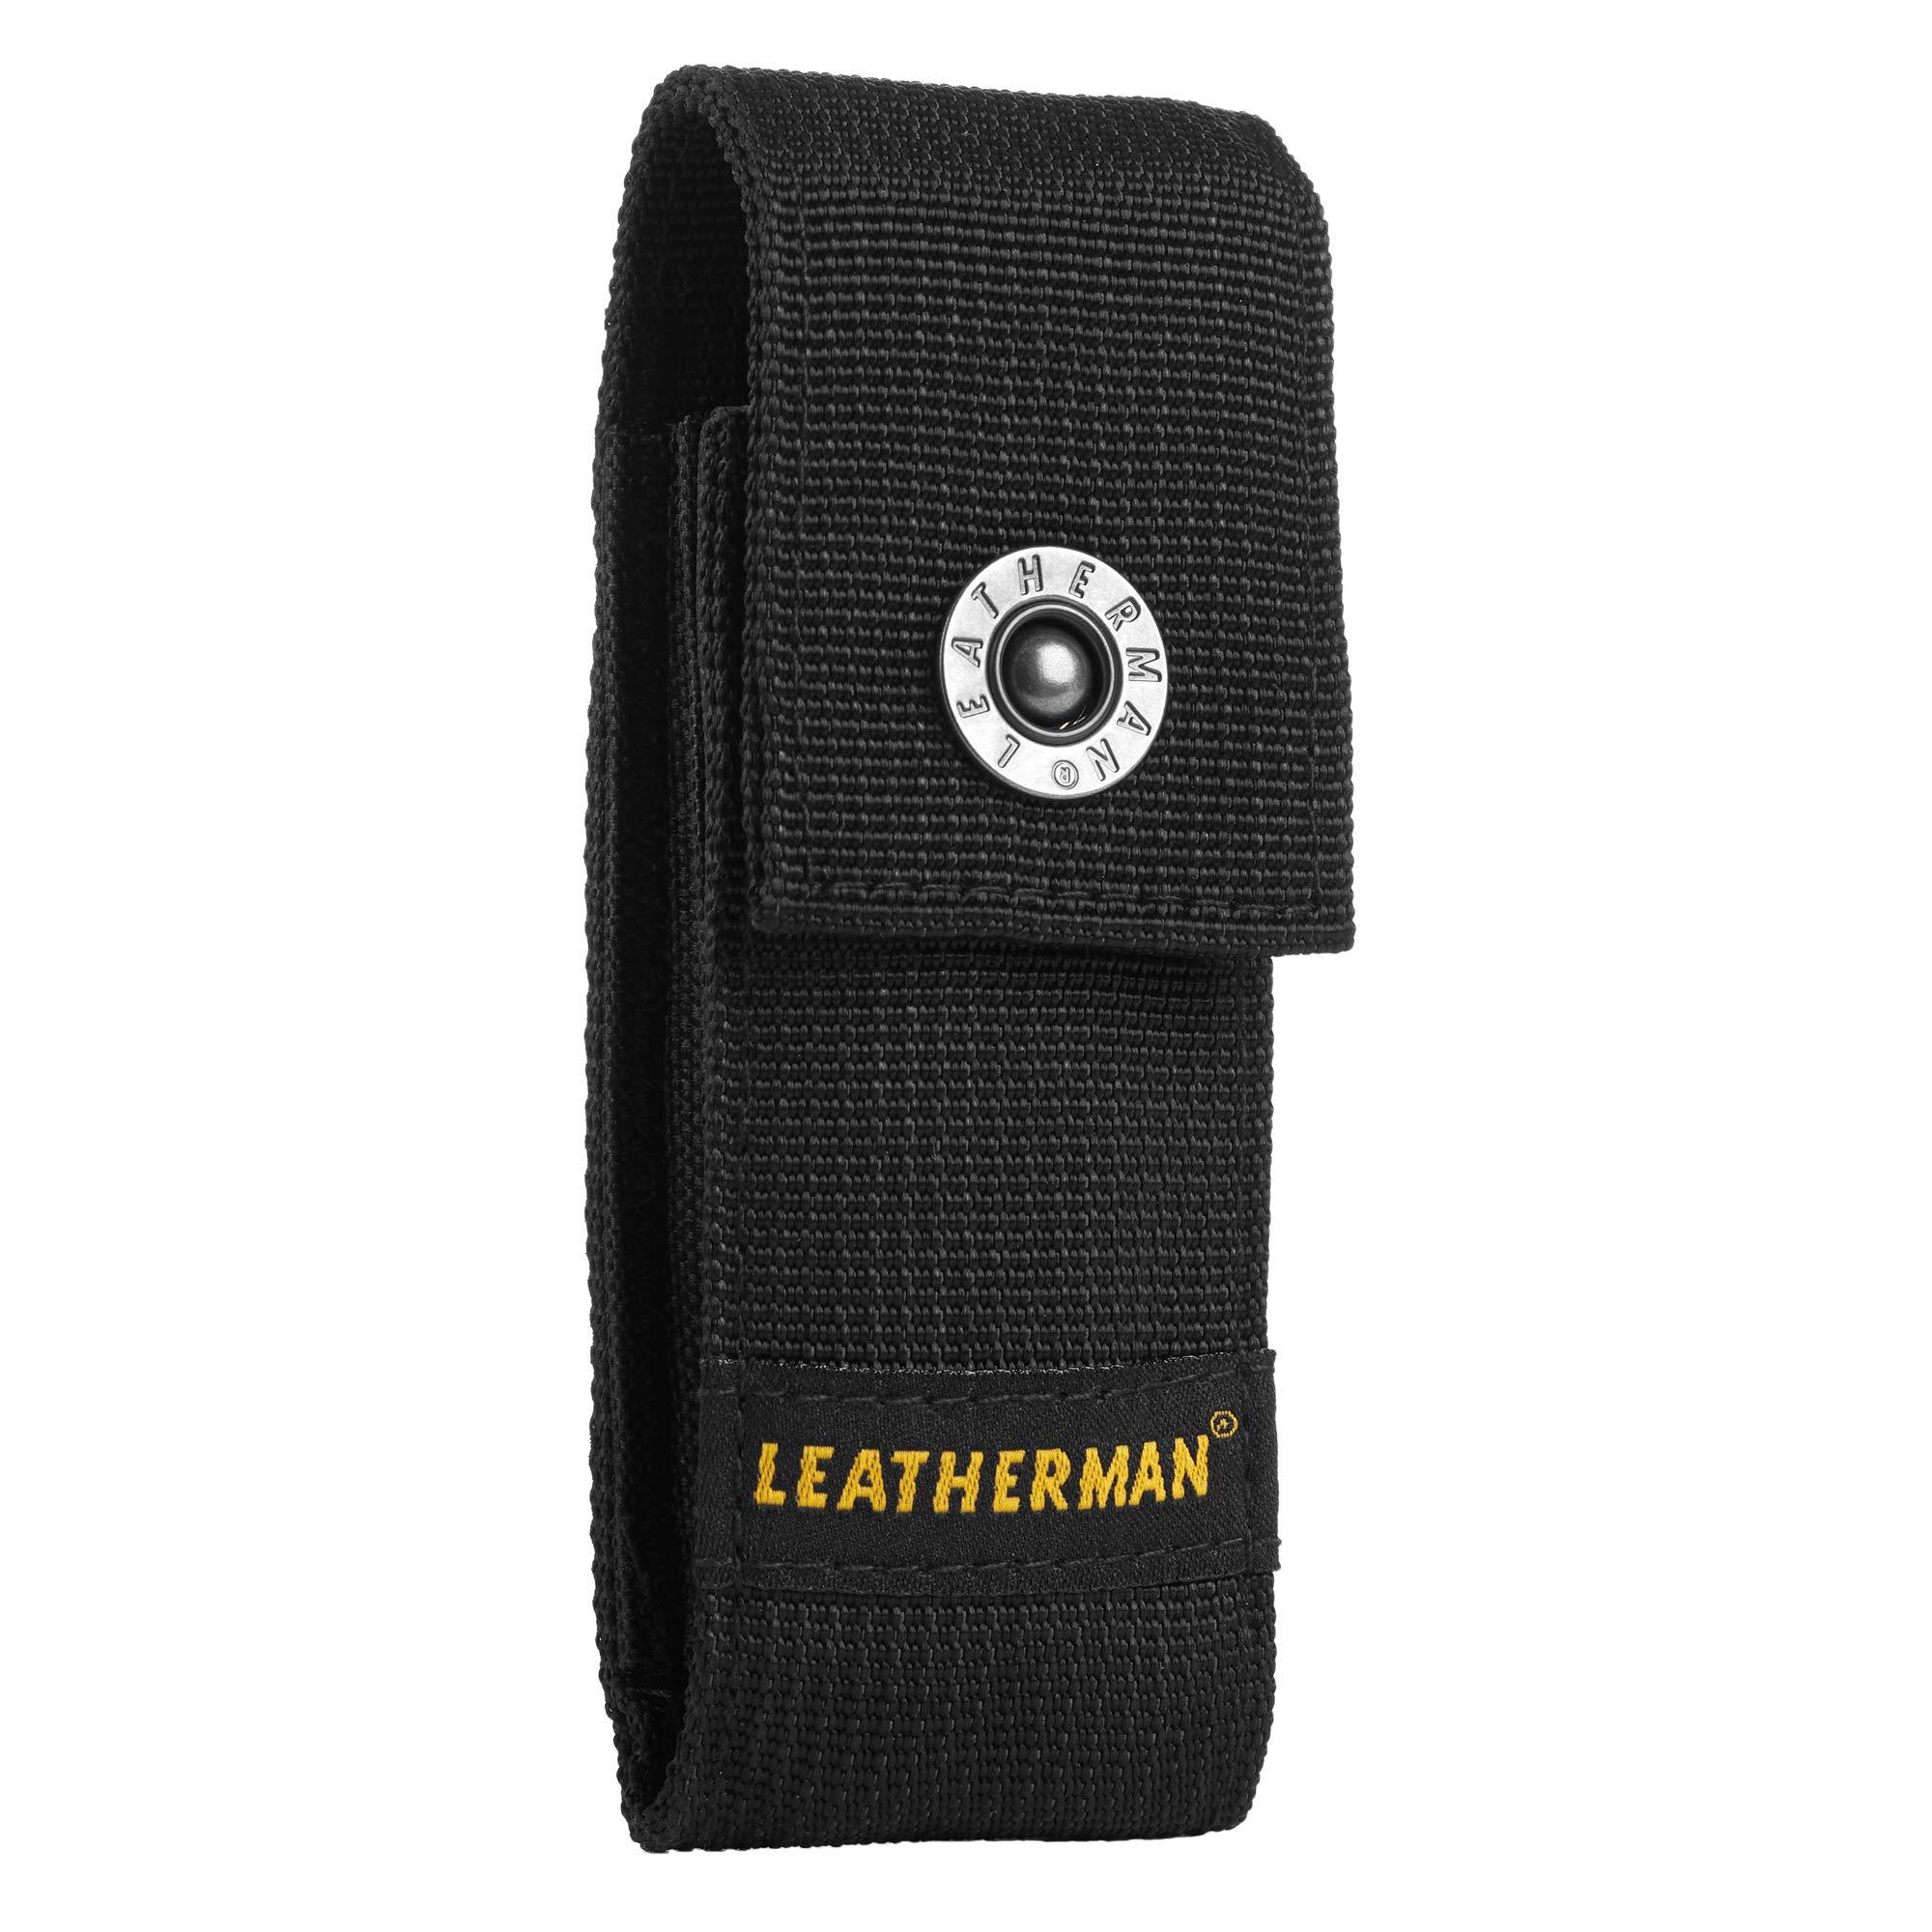 Leatherman - Wave Plus Multitool, Nylon Sheath, Black/Silver, Limited Edition by LEATHERMAN (Image #7)